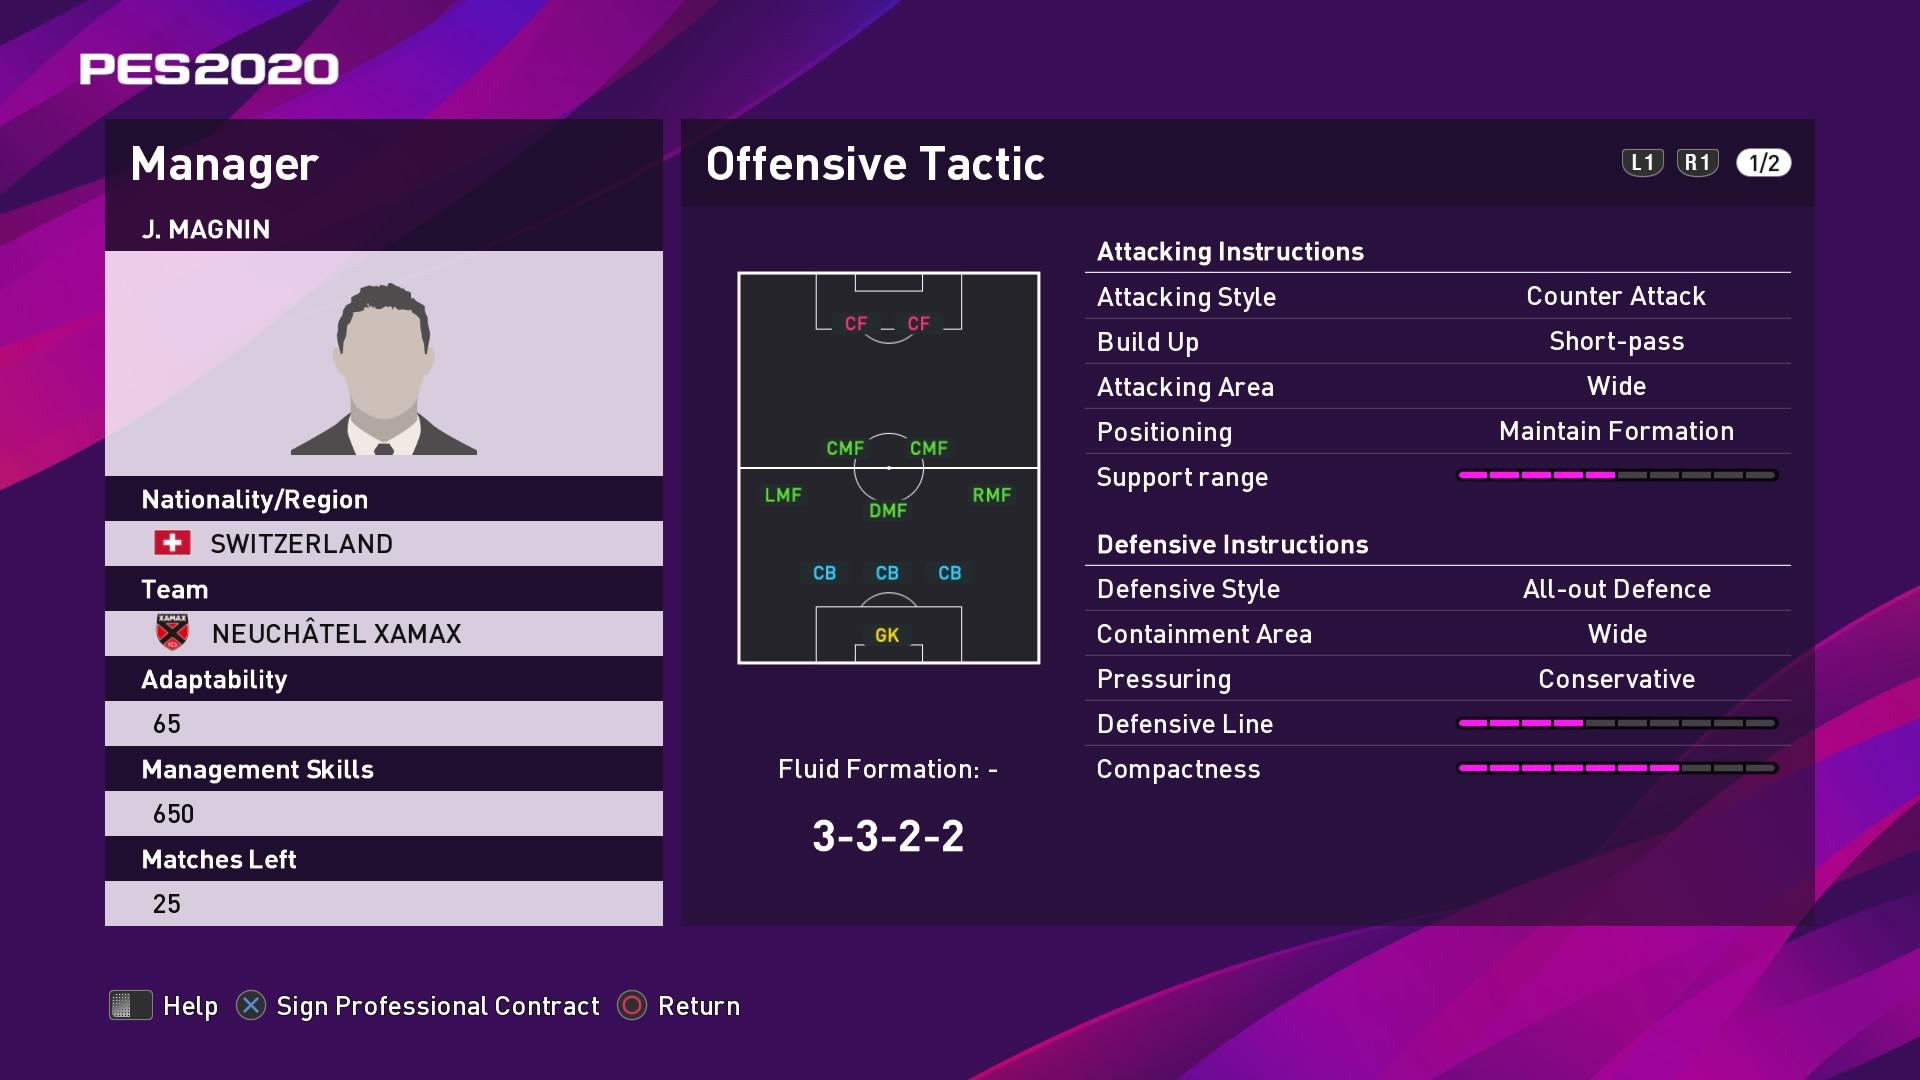 J. Magnin (Joël Magnin) Offensive Tactic in PES 2020 myClub